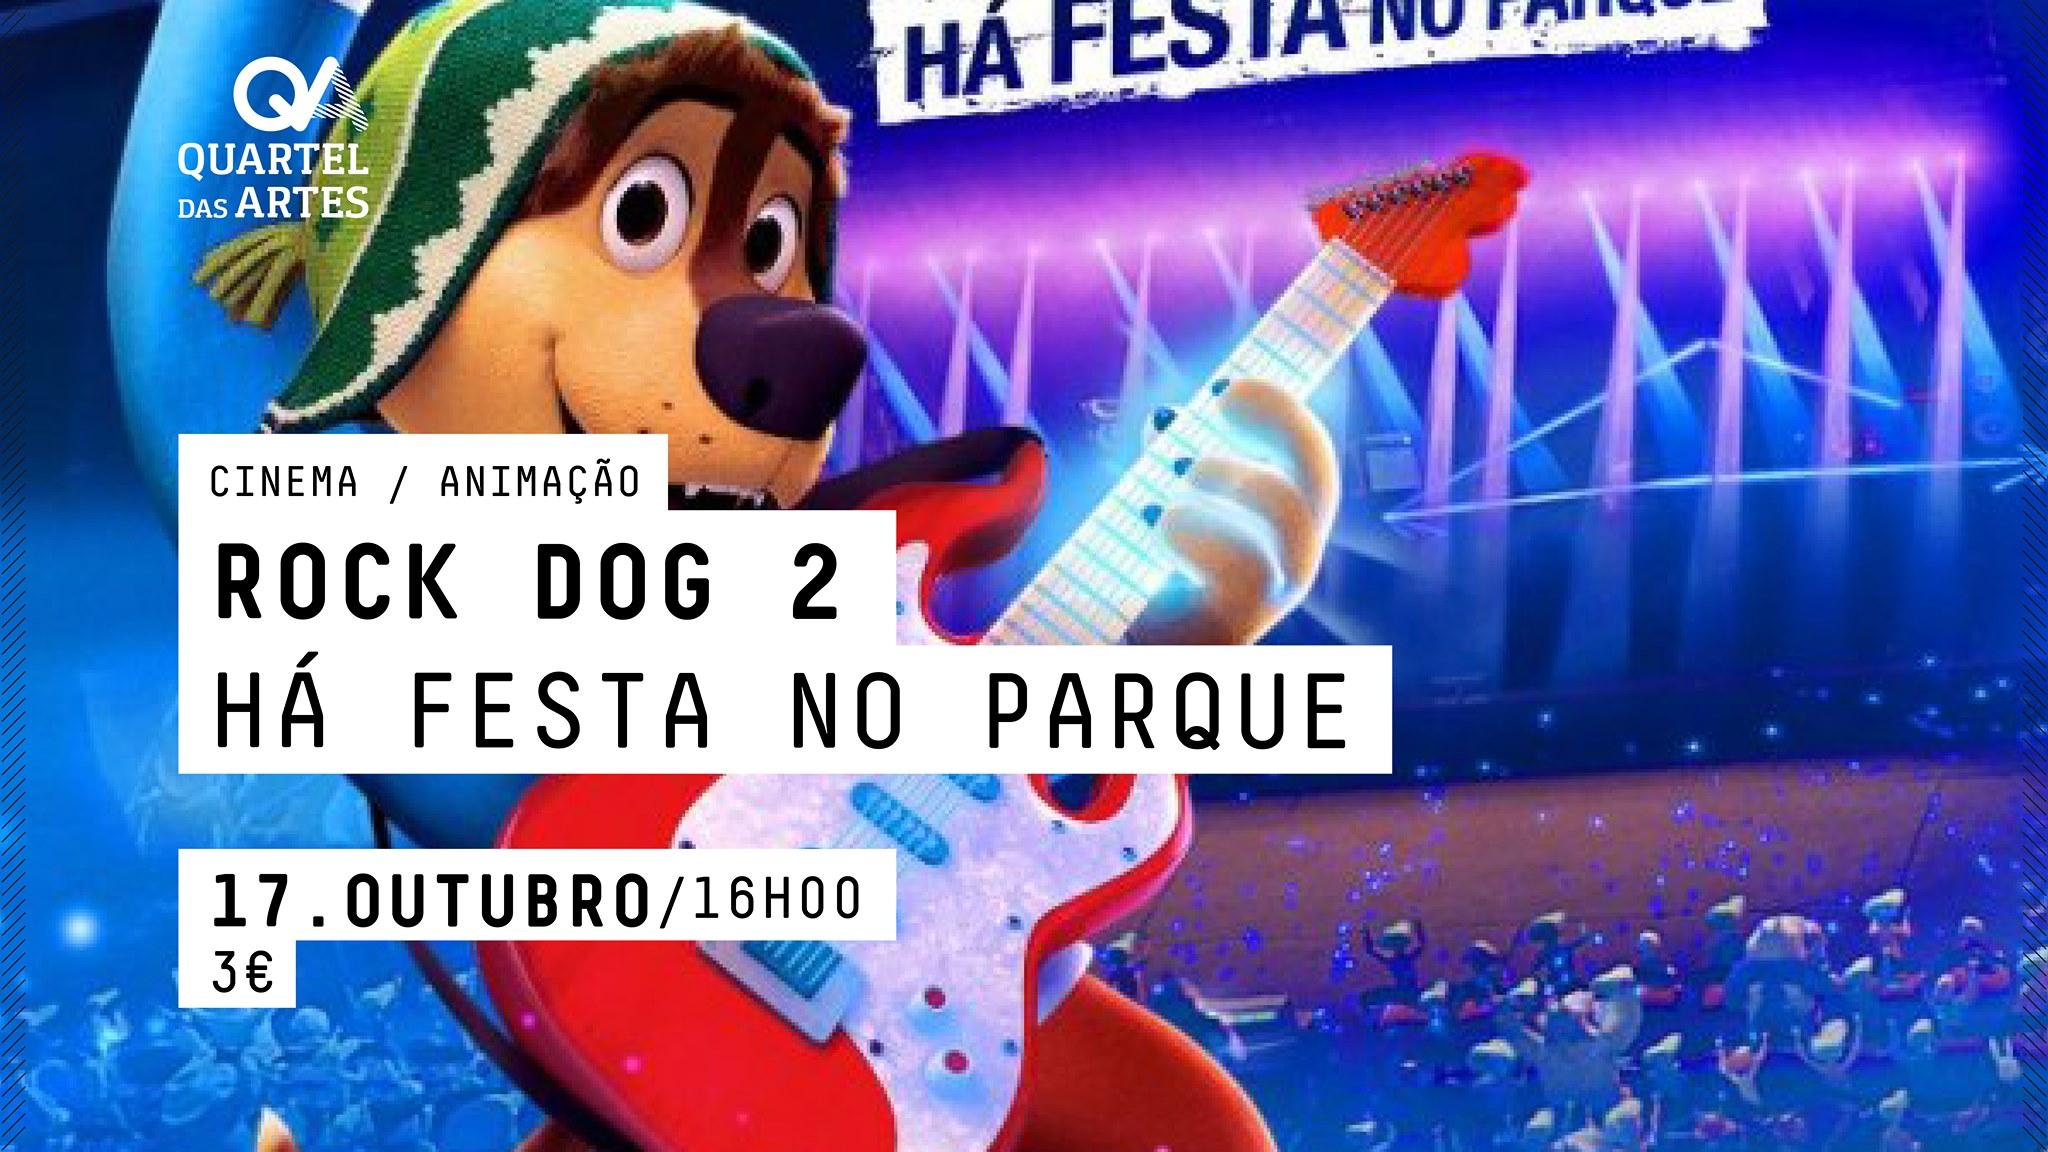 ROCK DOG 2 HÁ FESTA NO PARQUE - CINEMA